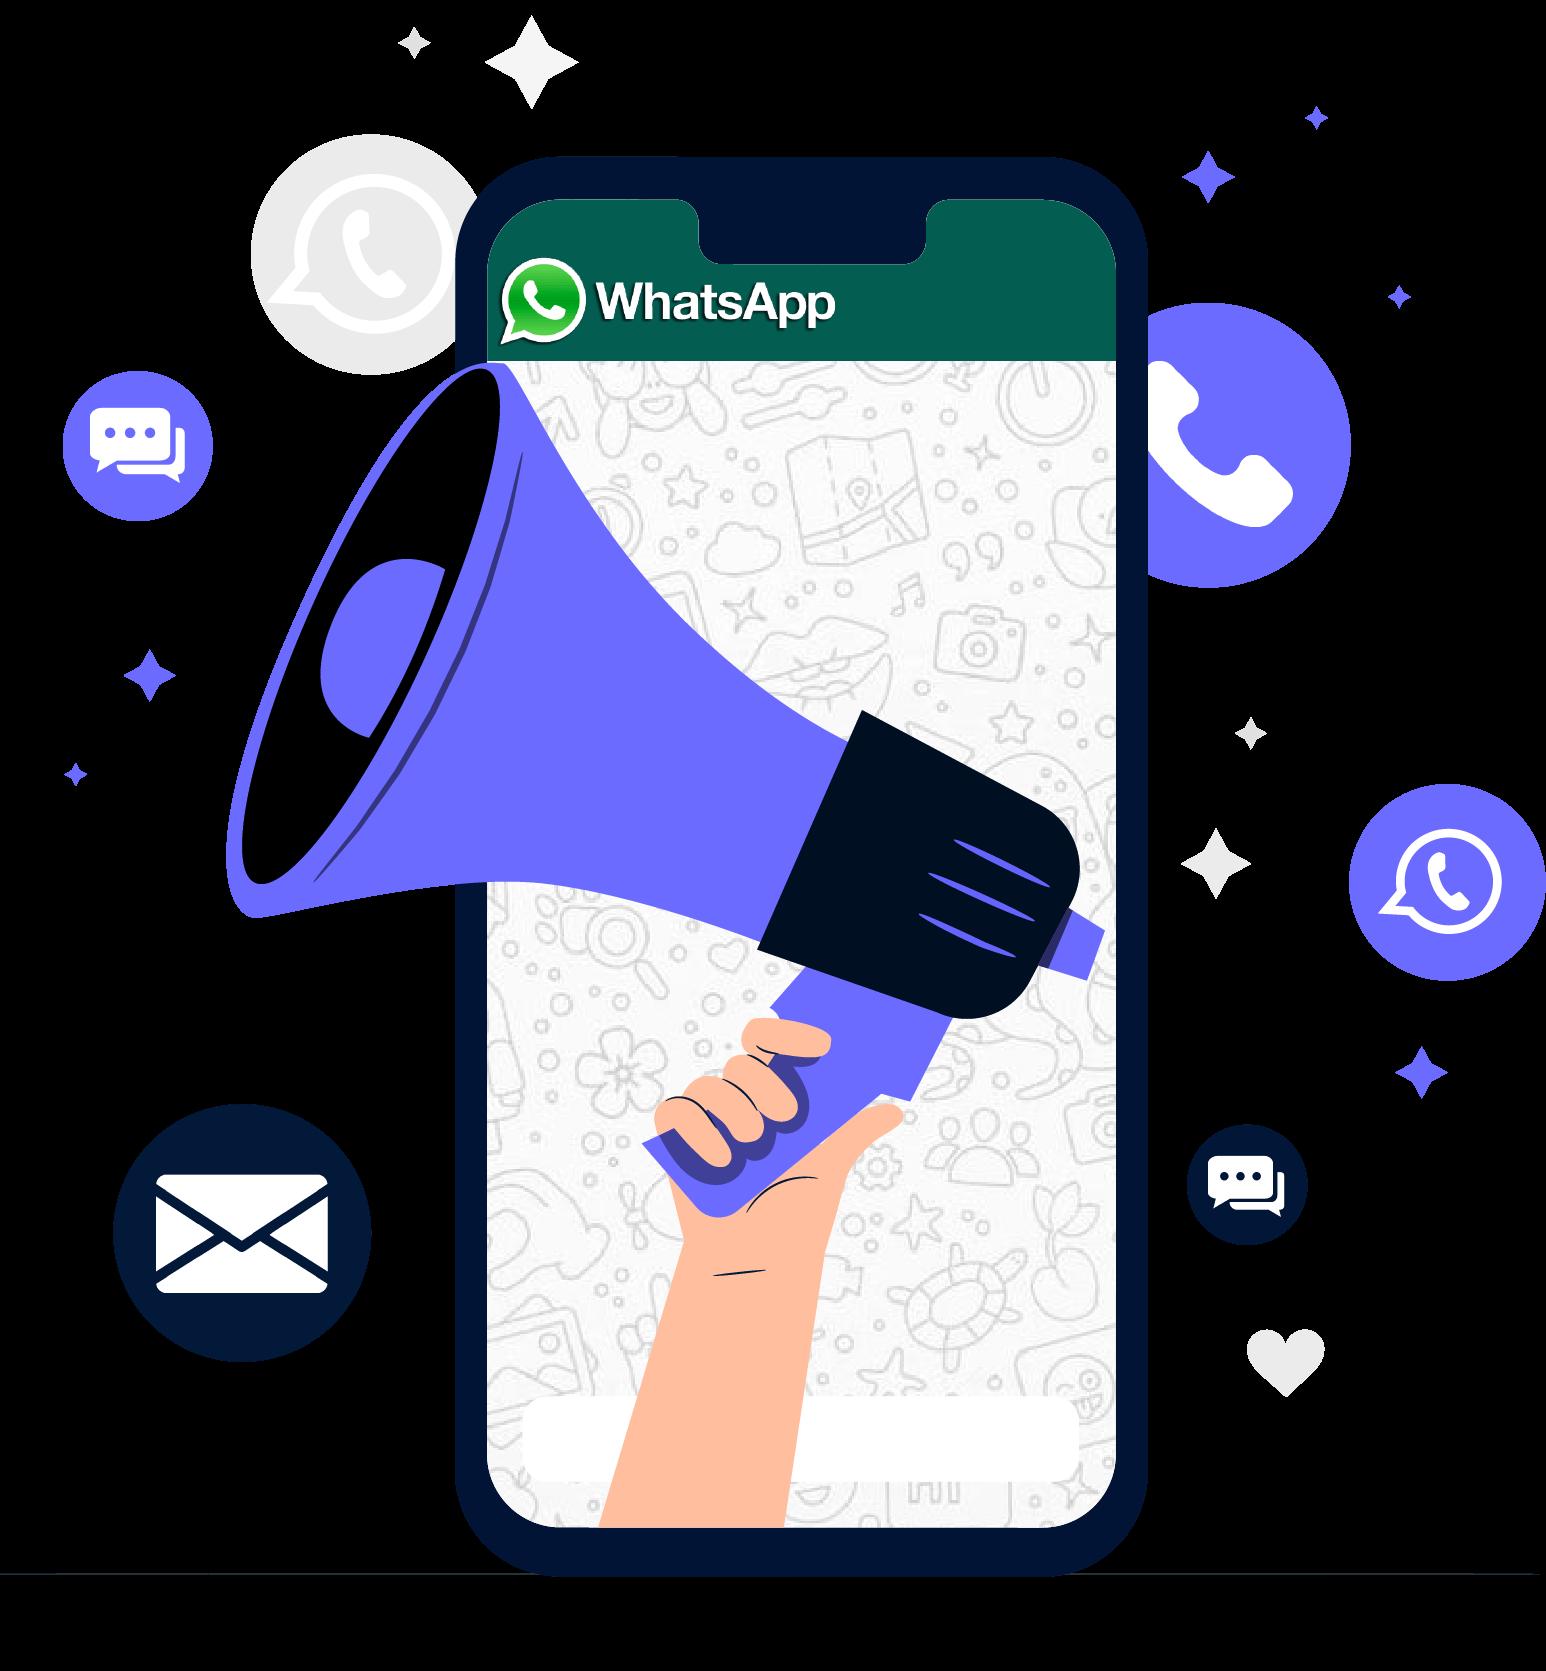 Msg91 WhatsApp Integration